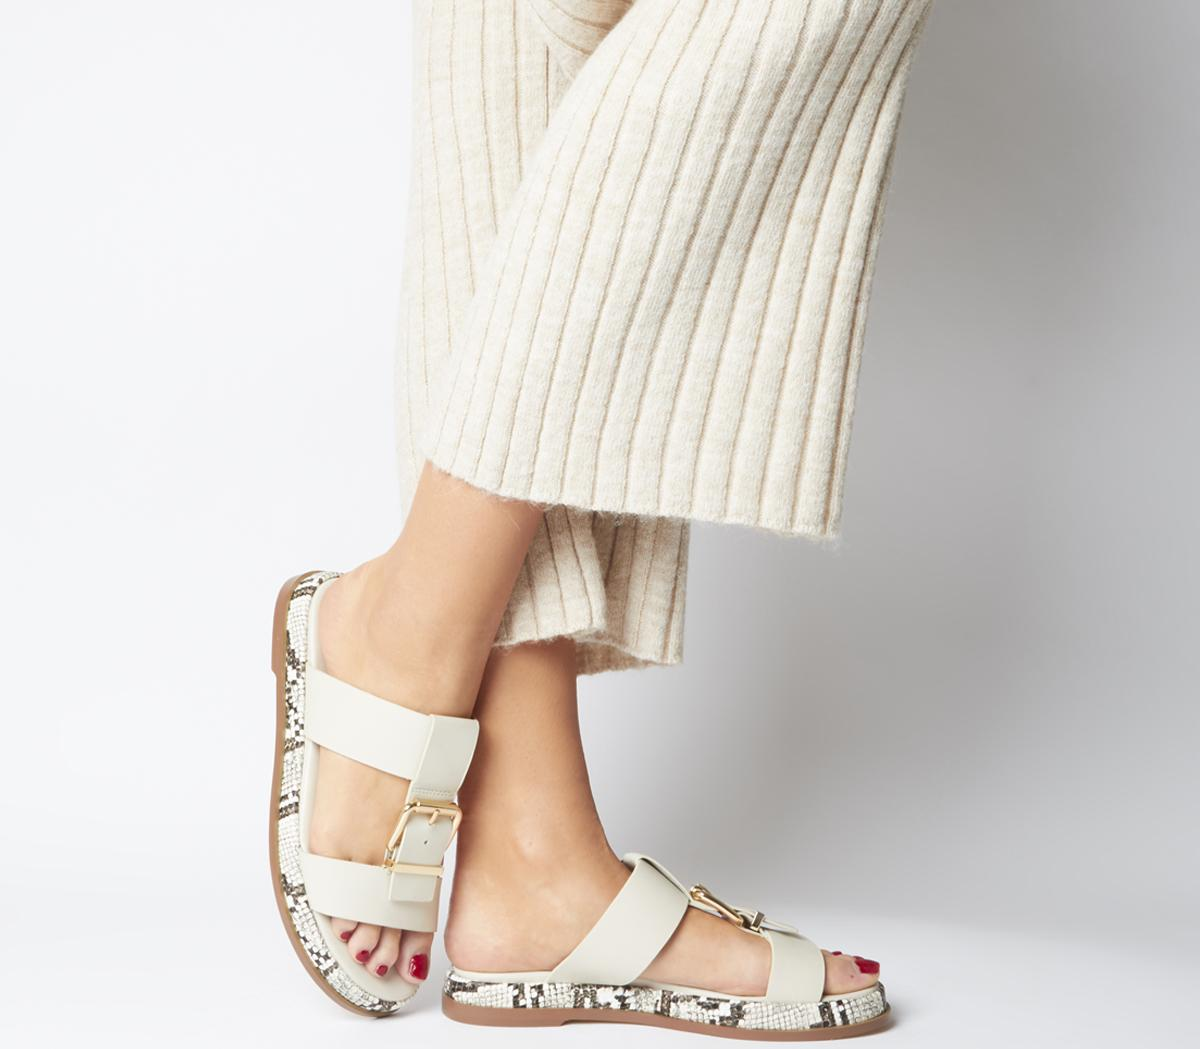 Stunner Buckle Strap Mule Sandals